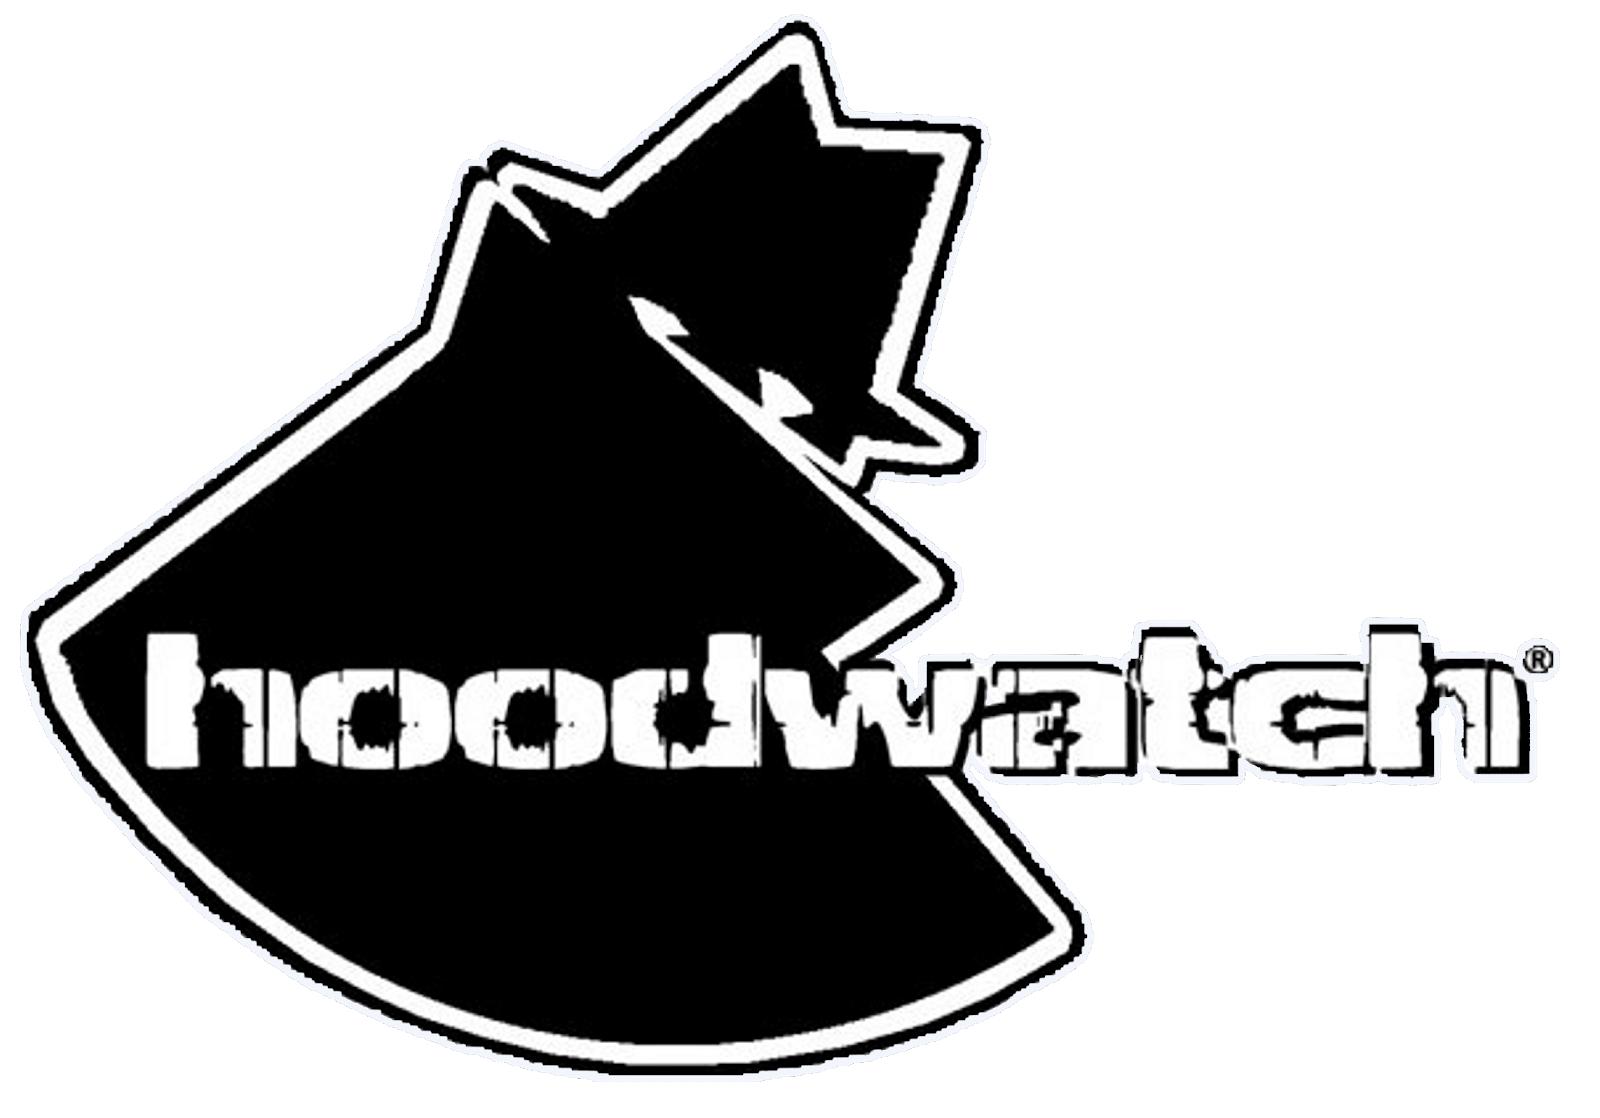 TheHoodIsWatching.com